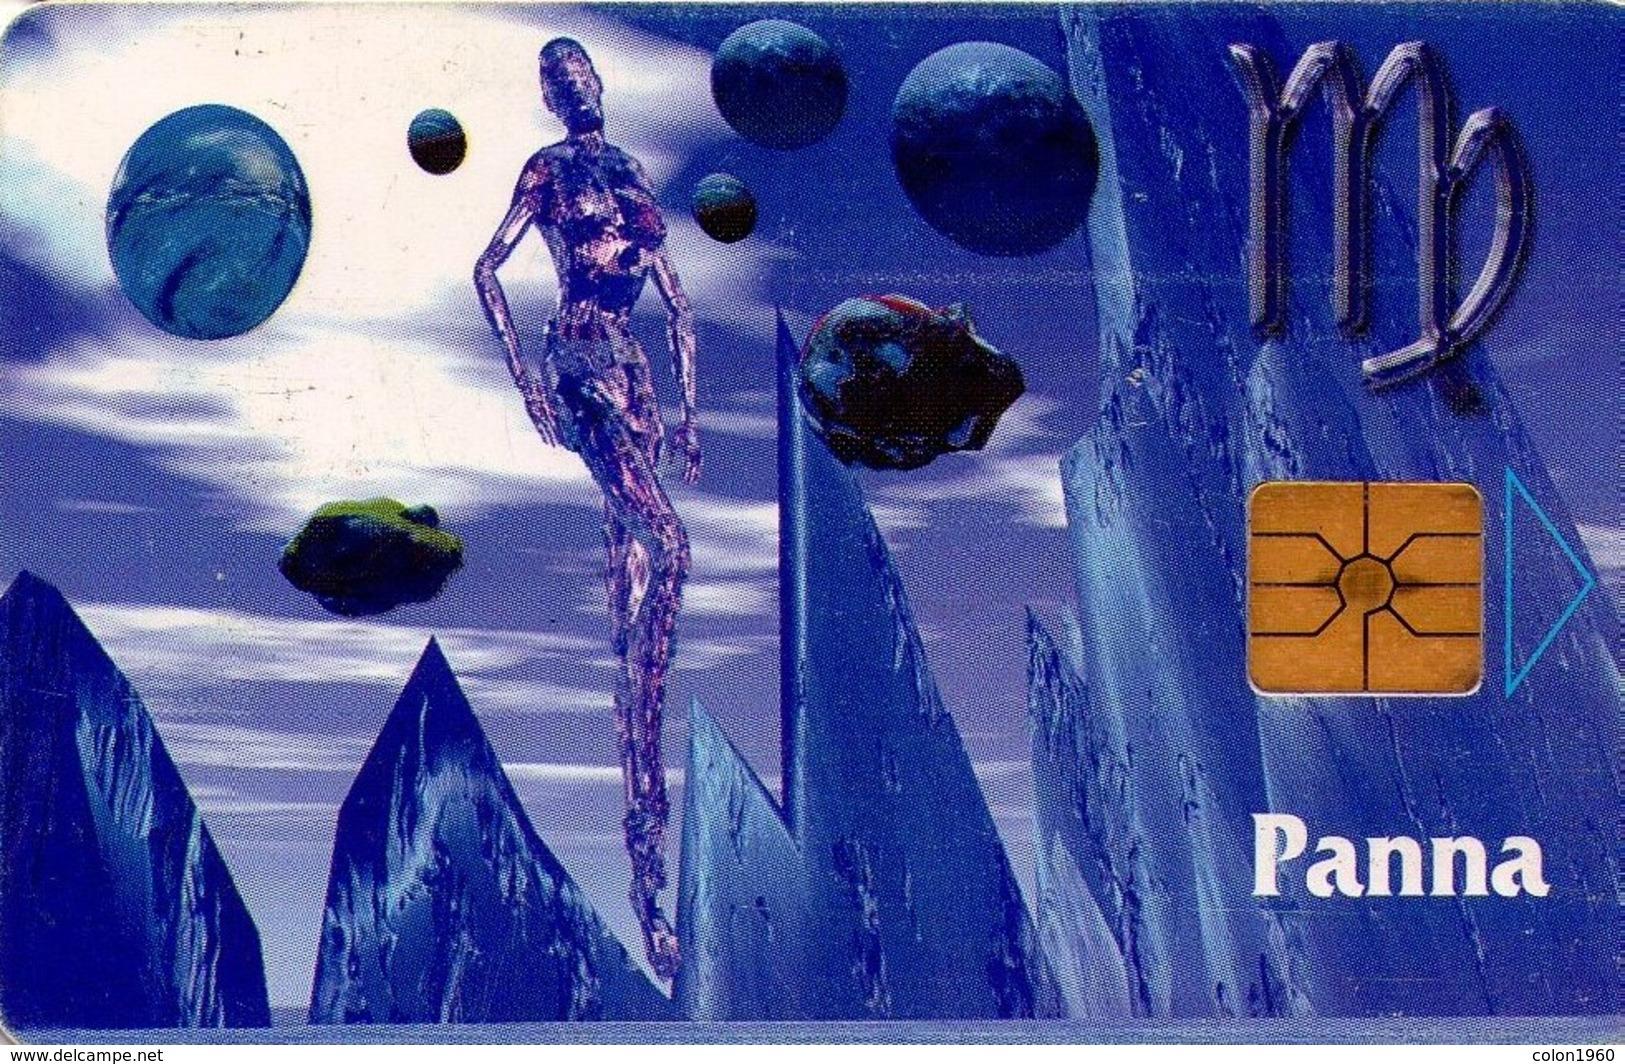 REPUBLICA CHECA. Zodiac - Panna (Virgo). C242A, 37/08.98. (020) - Zodiac